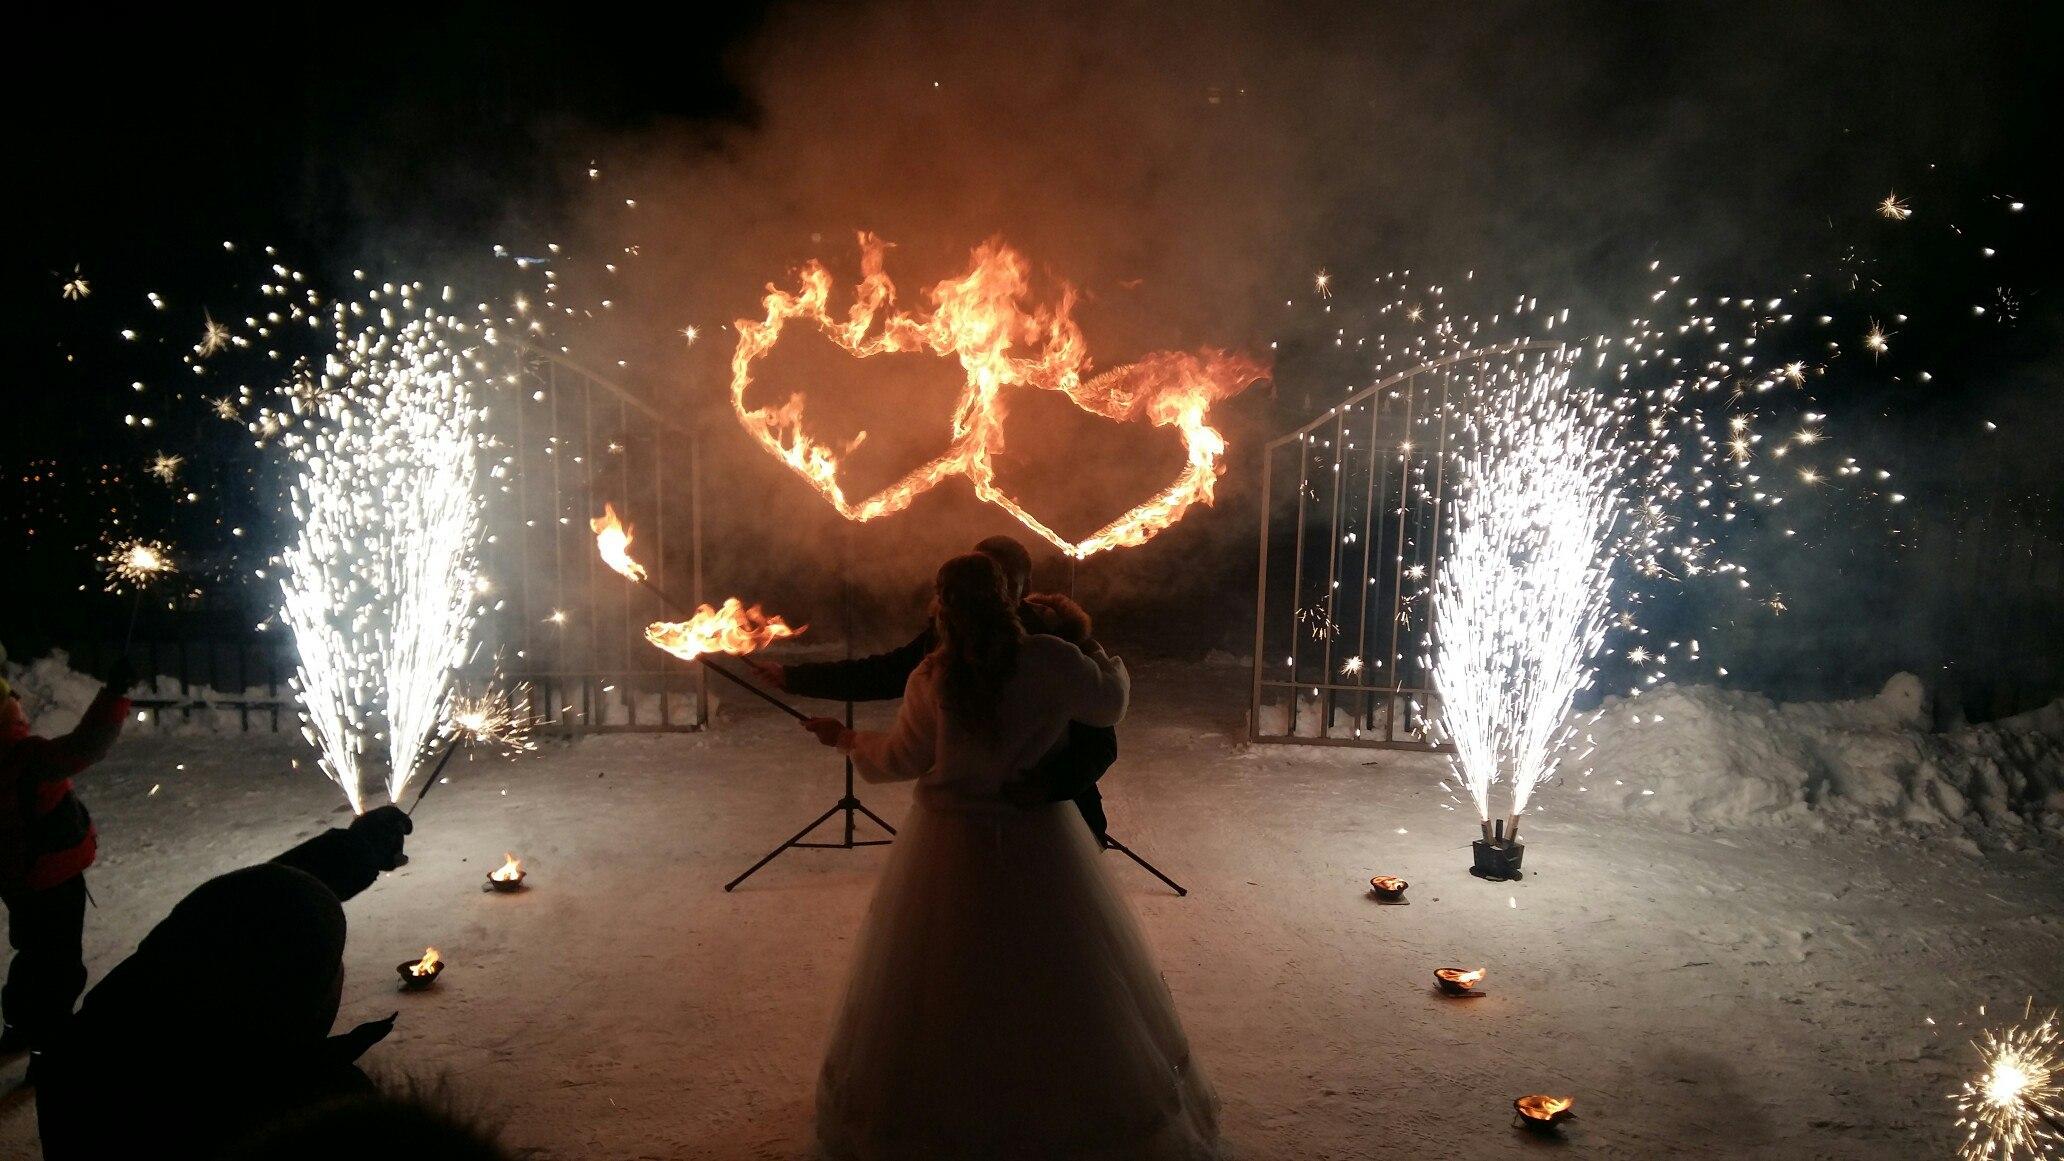 Салют на свадьбе - фото фаер-шоу, красивый фейерверк 36